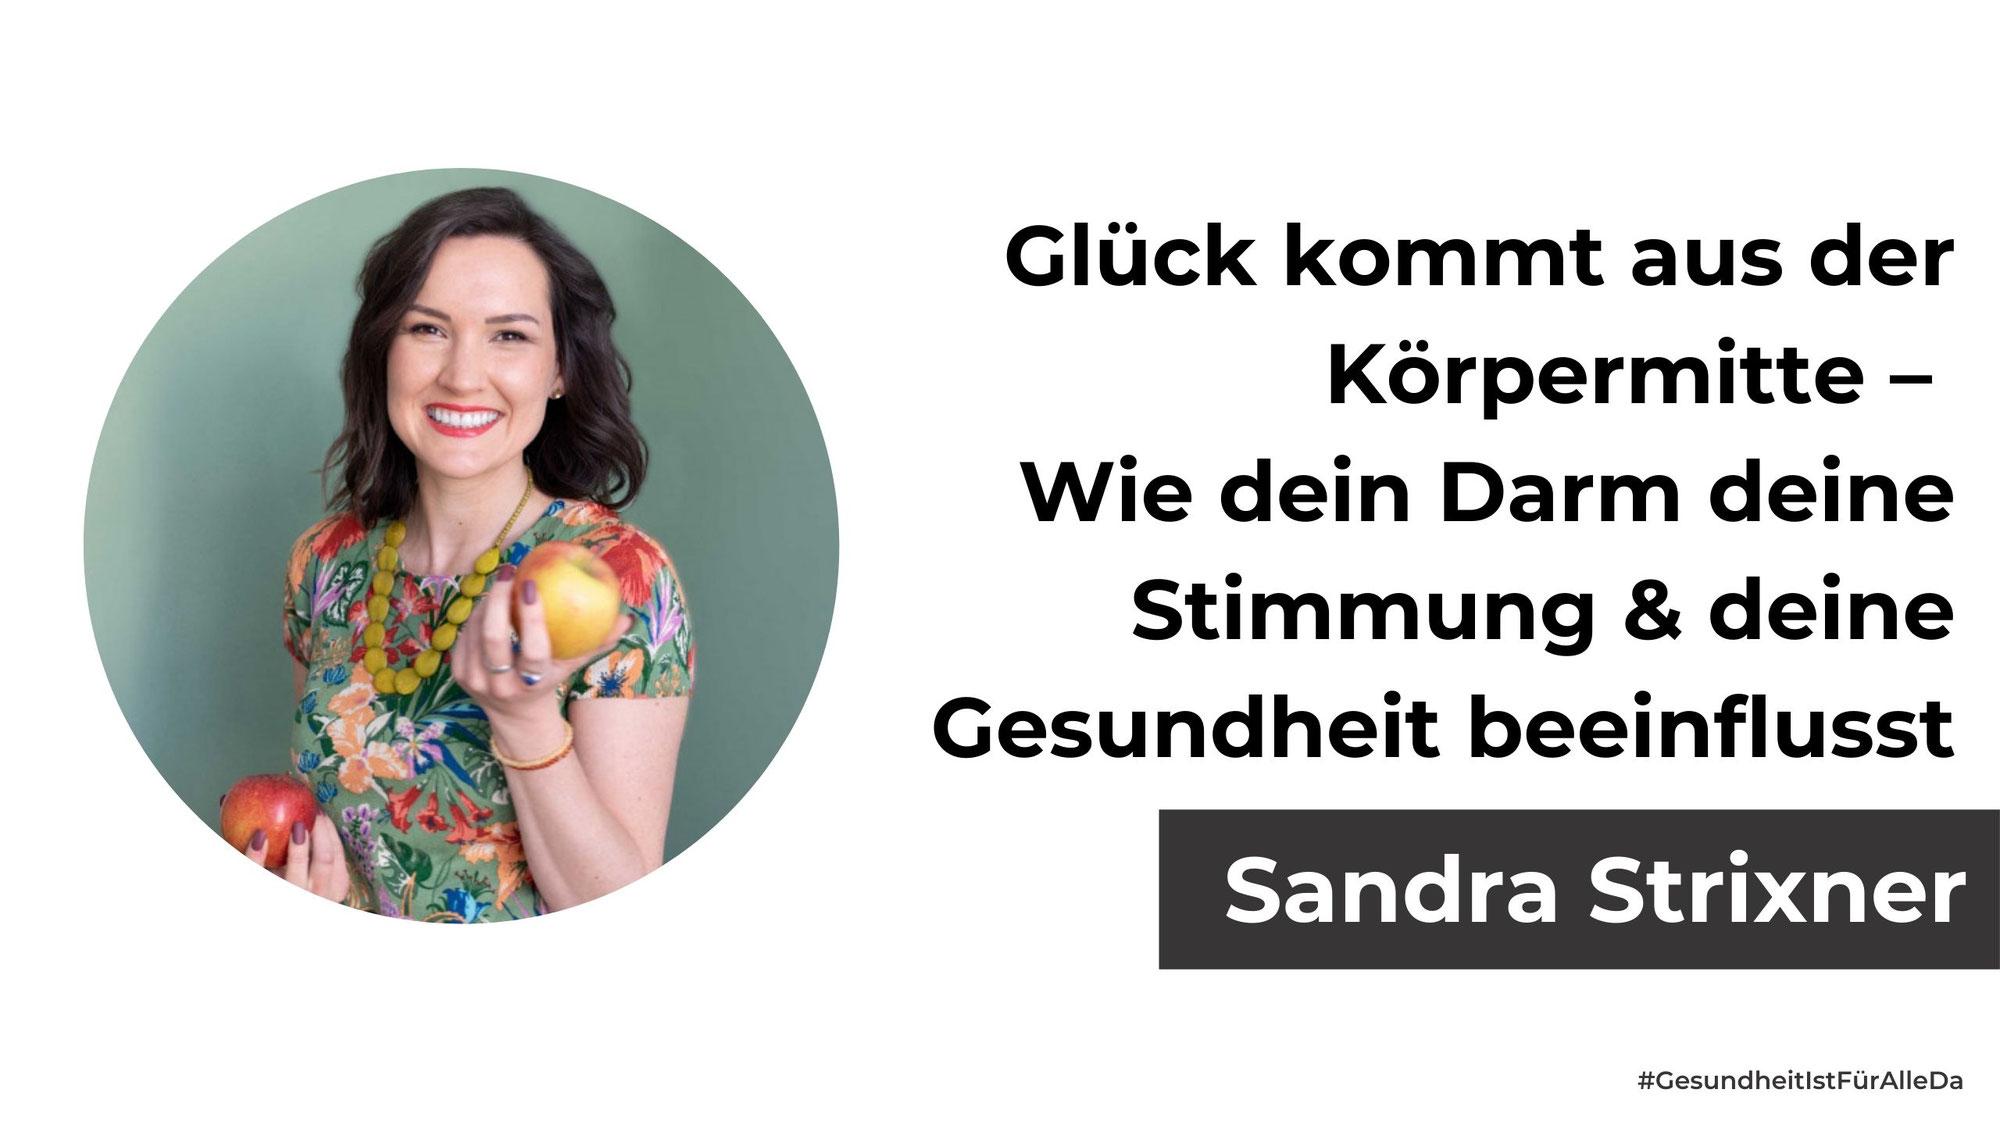 Sandra Strixner